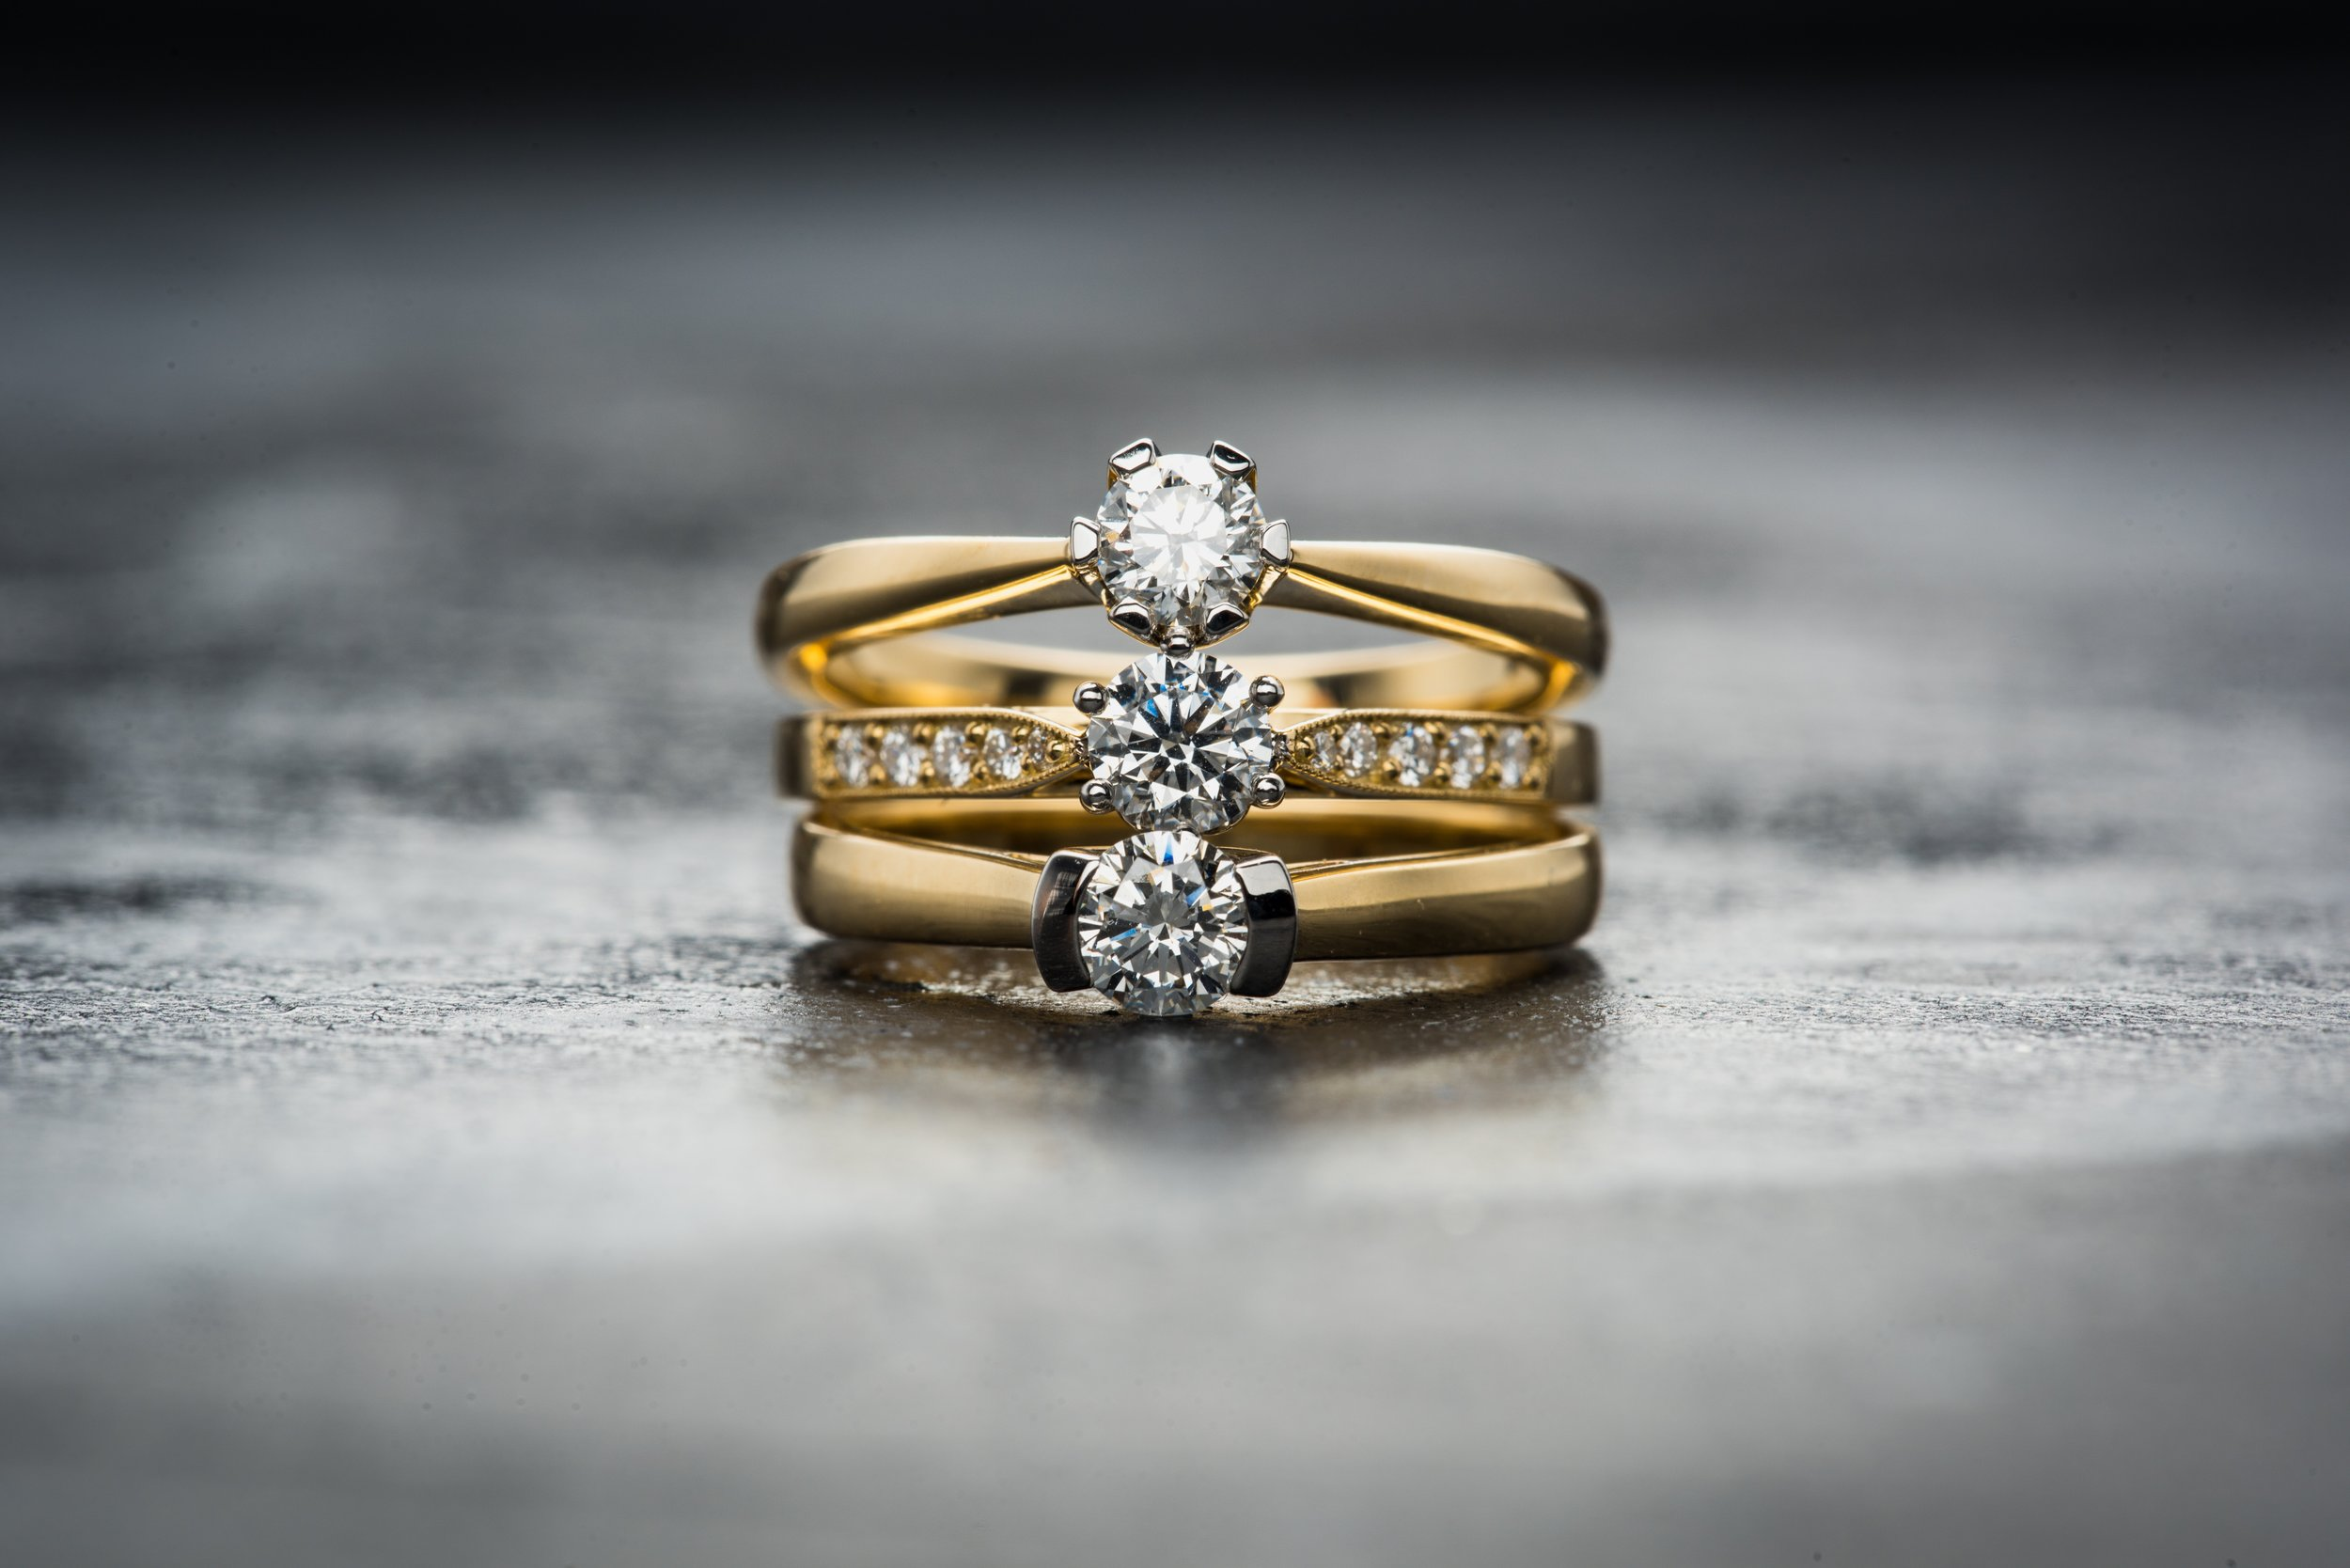 Custom Local Goldsmith - Over the Moon Goldsmith Studio Engagement Wedding & GiftsKelly Marie Kinser-Artist-Goldsmith-Owner www.overthemoon.studio 319.975.1088 hello@overthemoon.studio